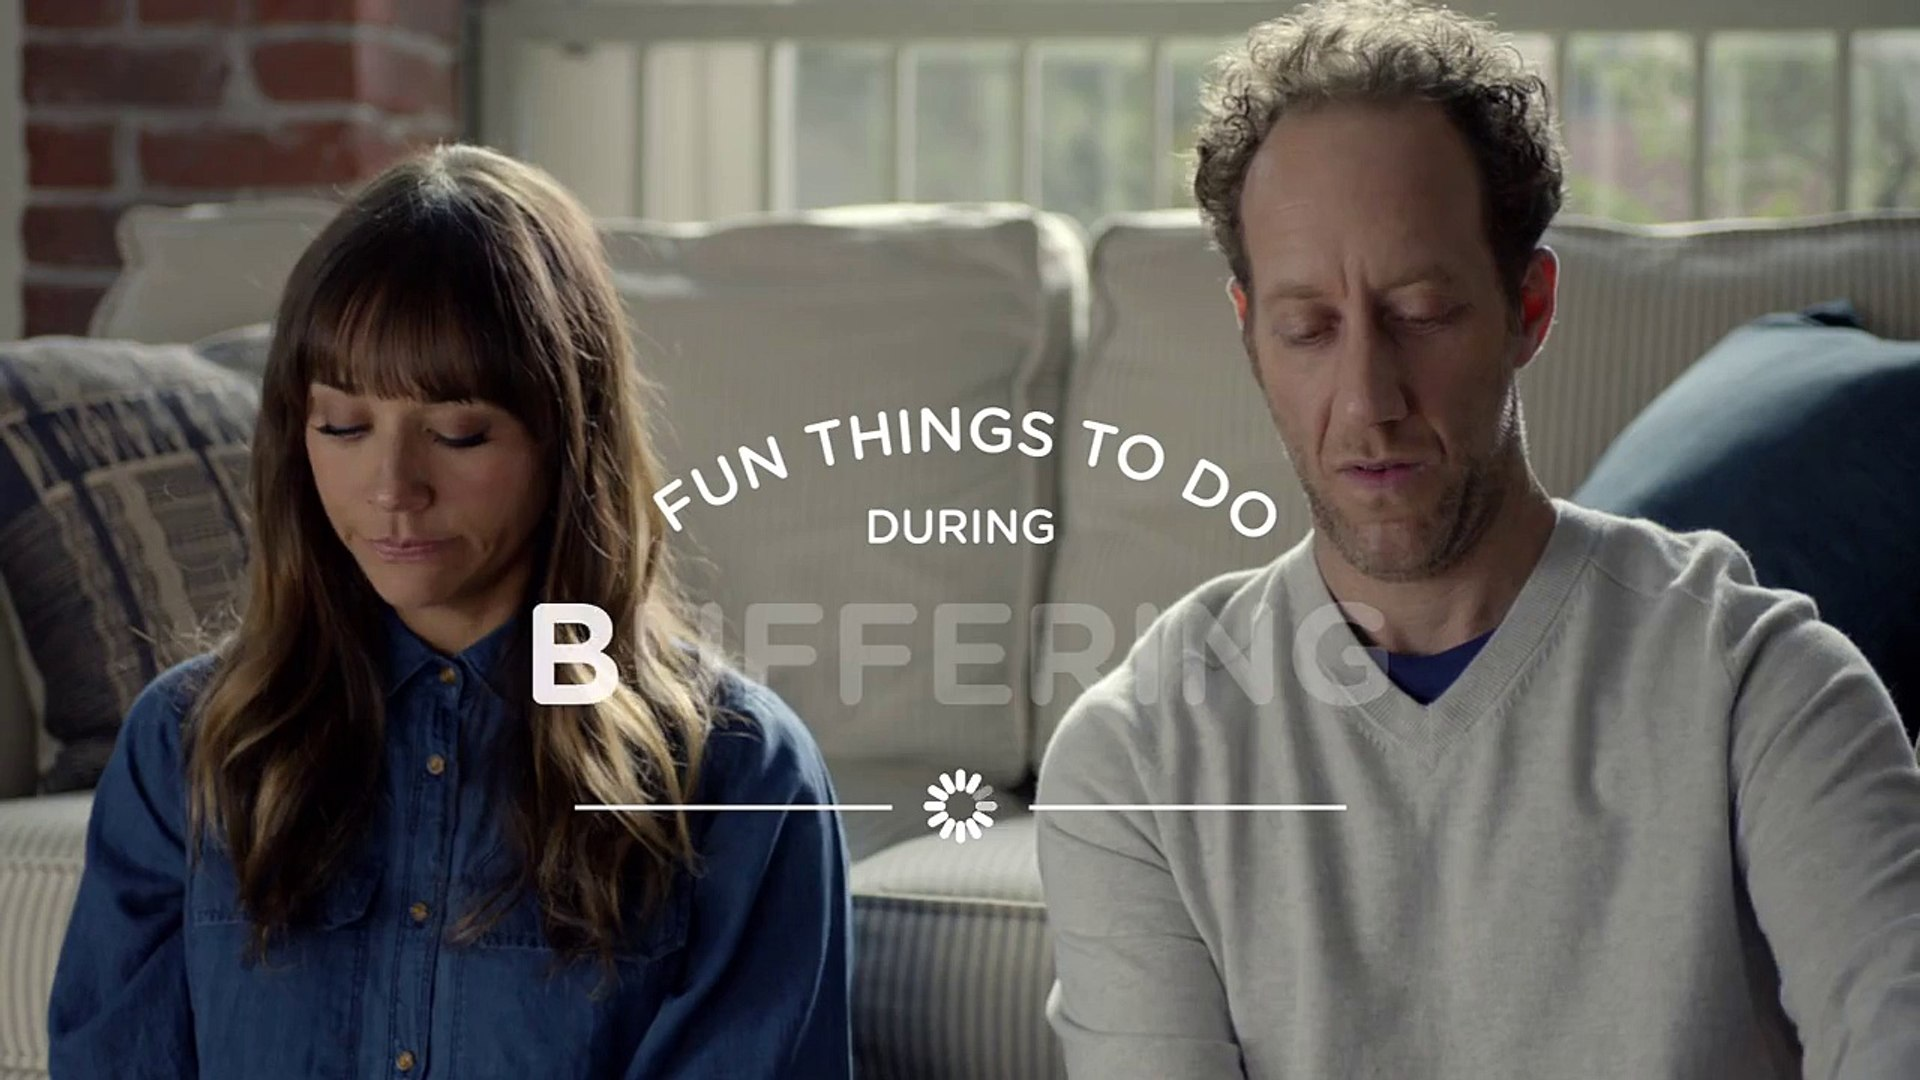 FUN THINGS TO DO DURING BUFFERING: Origami